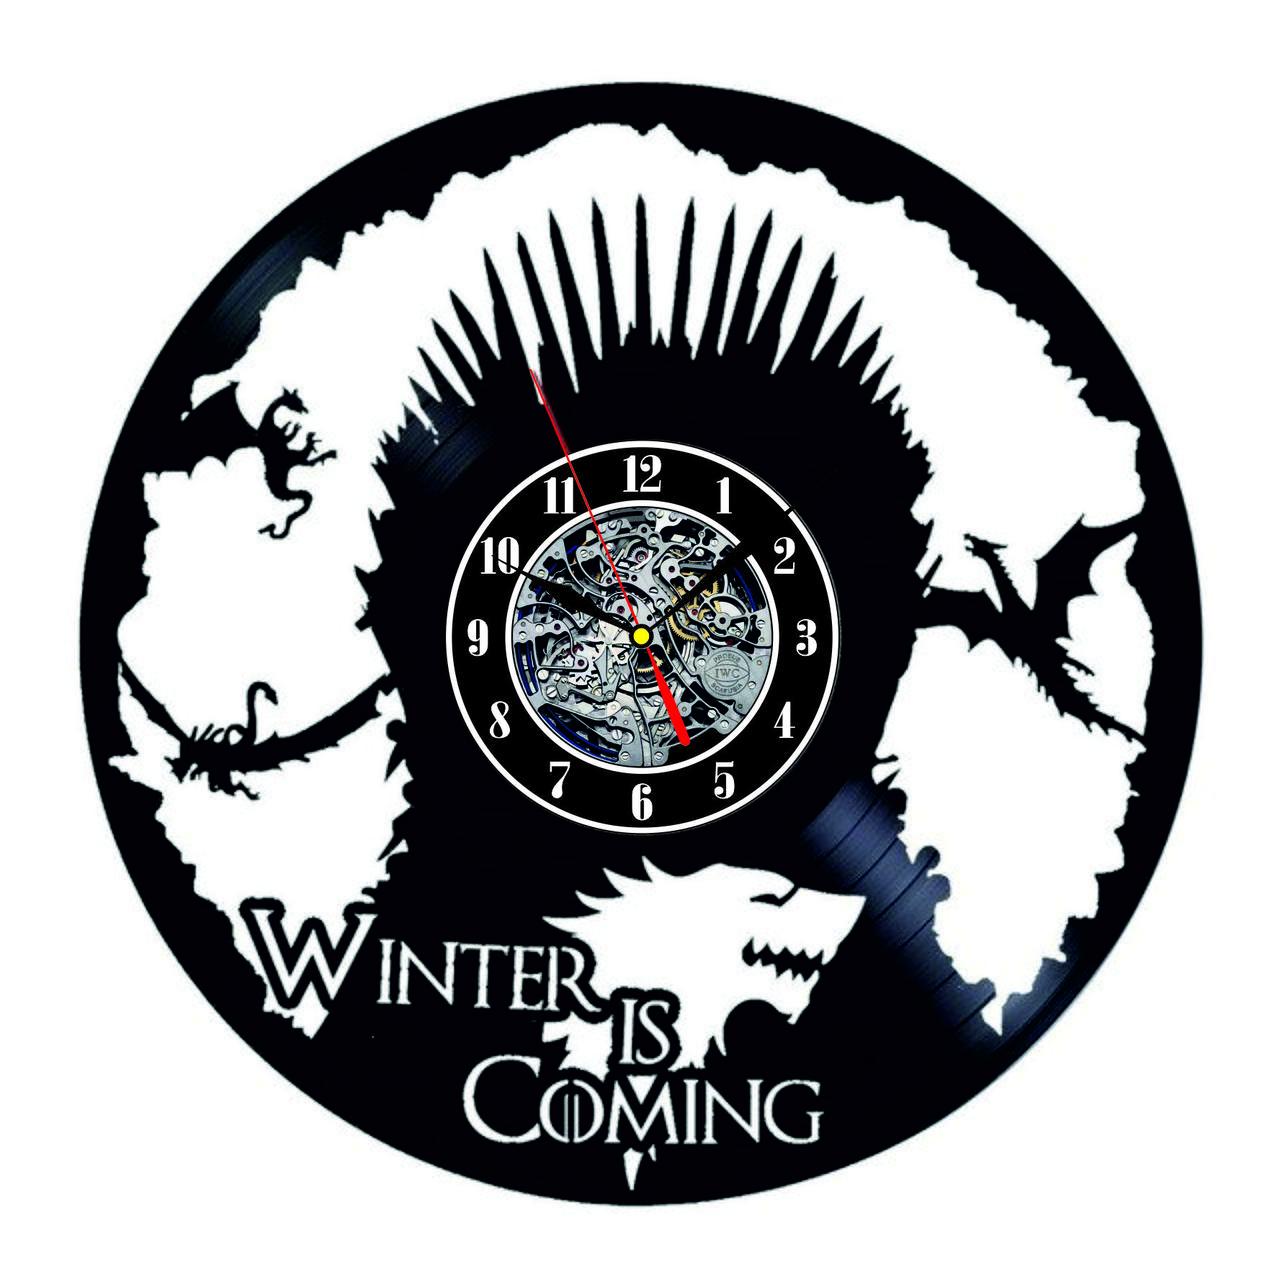 Настенные часы из виниловых пластинок LikeMark Game of Thrones 2